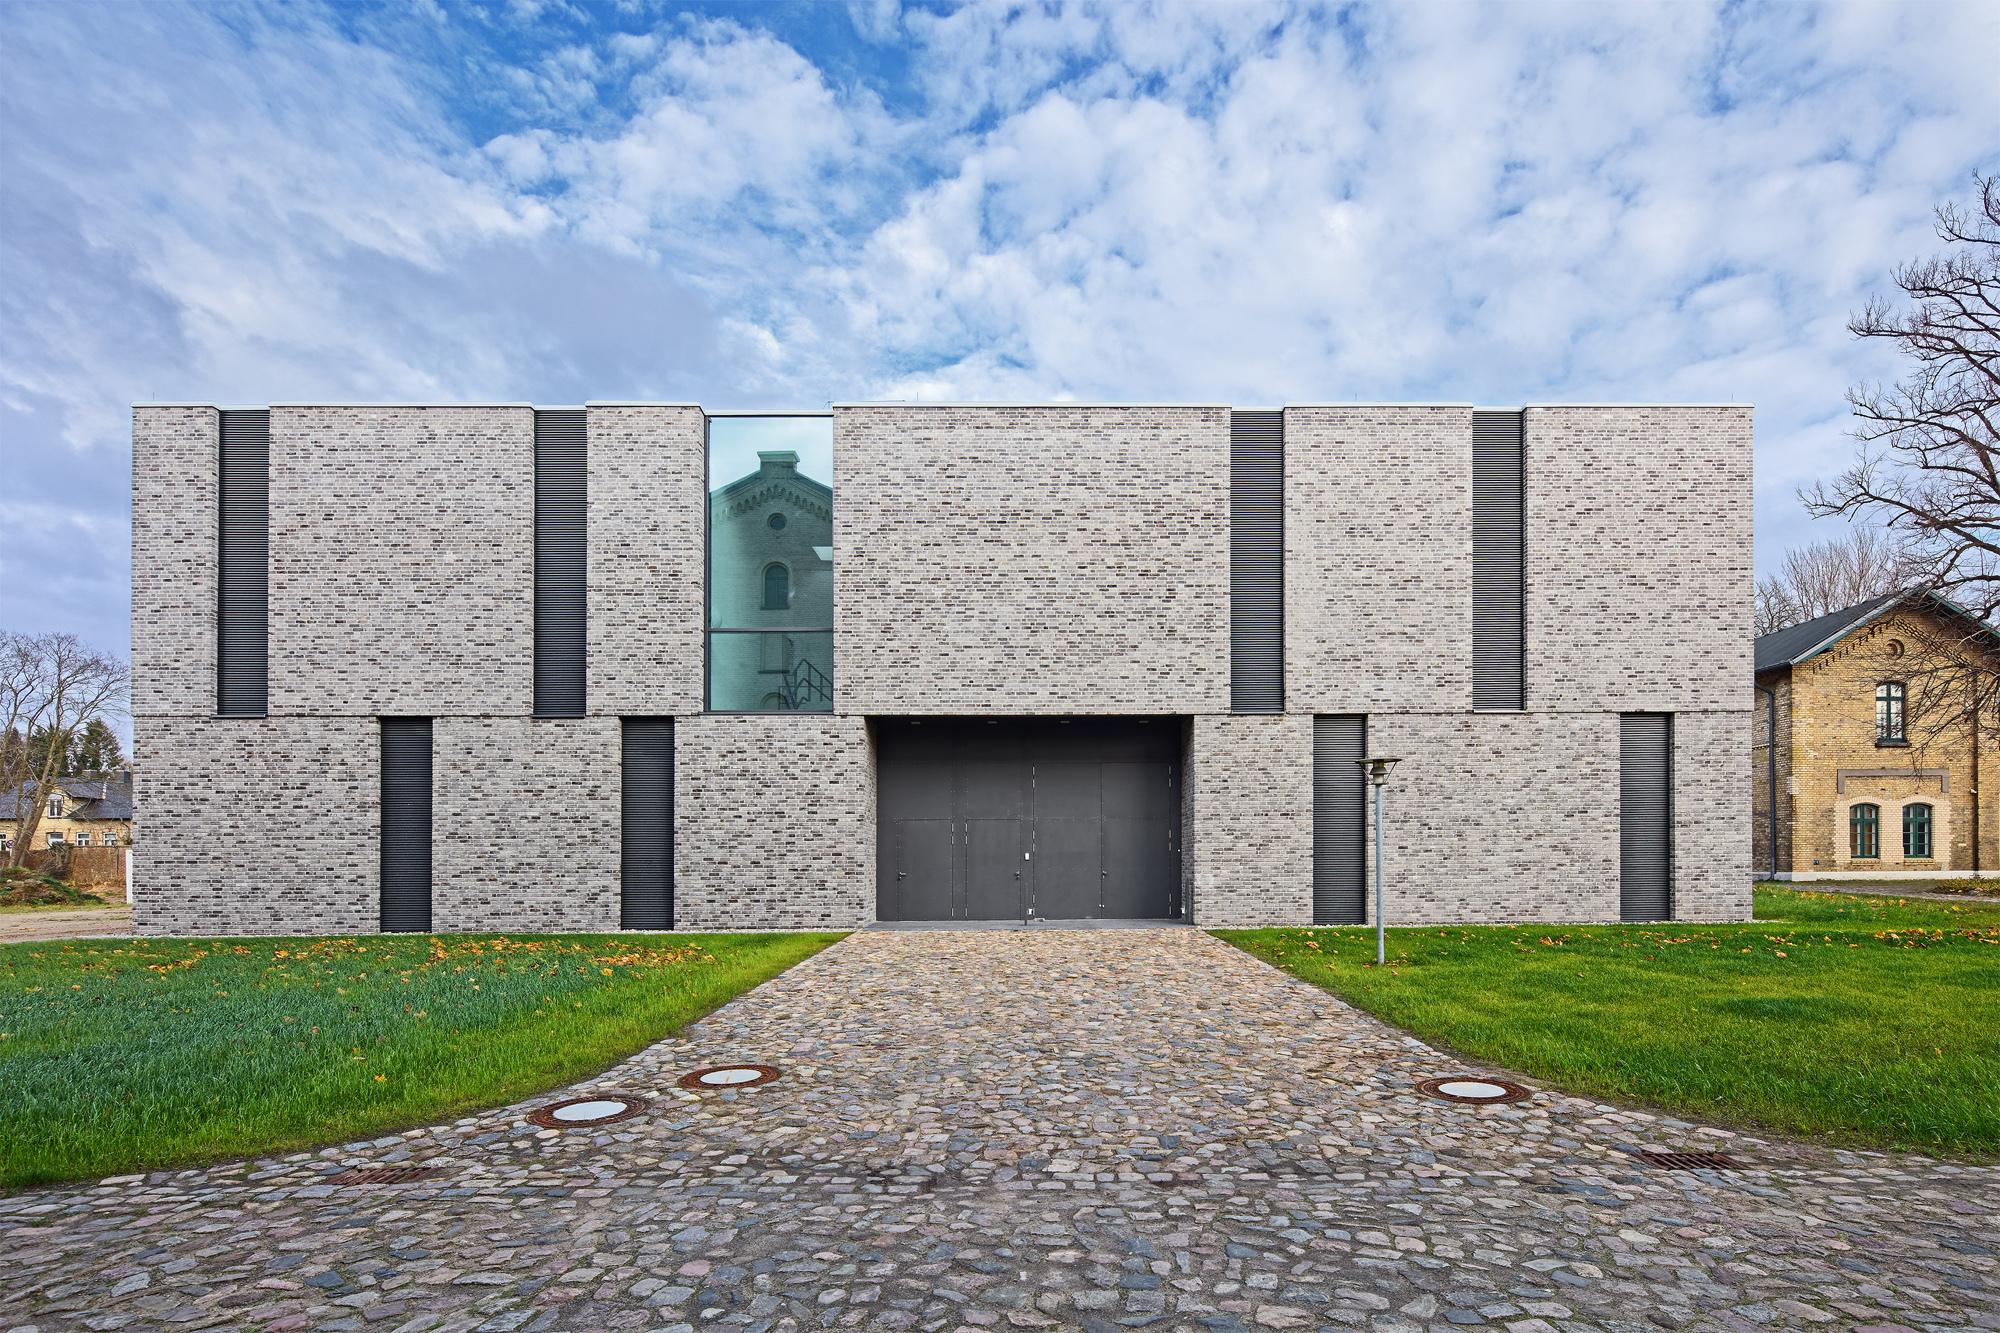 Magazingebäude auf dem Hesterberg (Fotos ©: Bernd Perlbach)